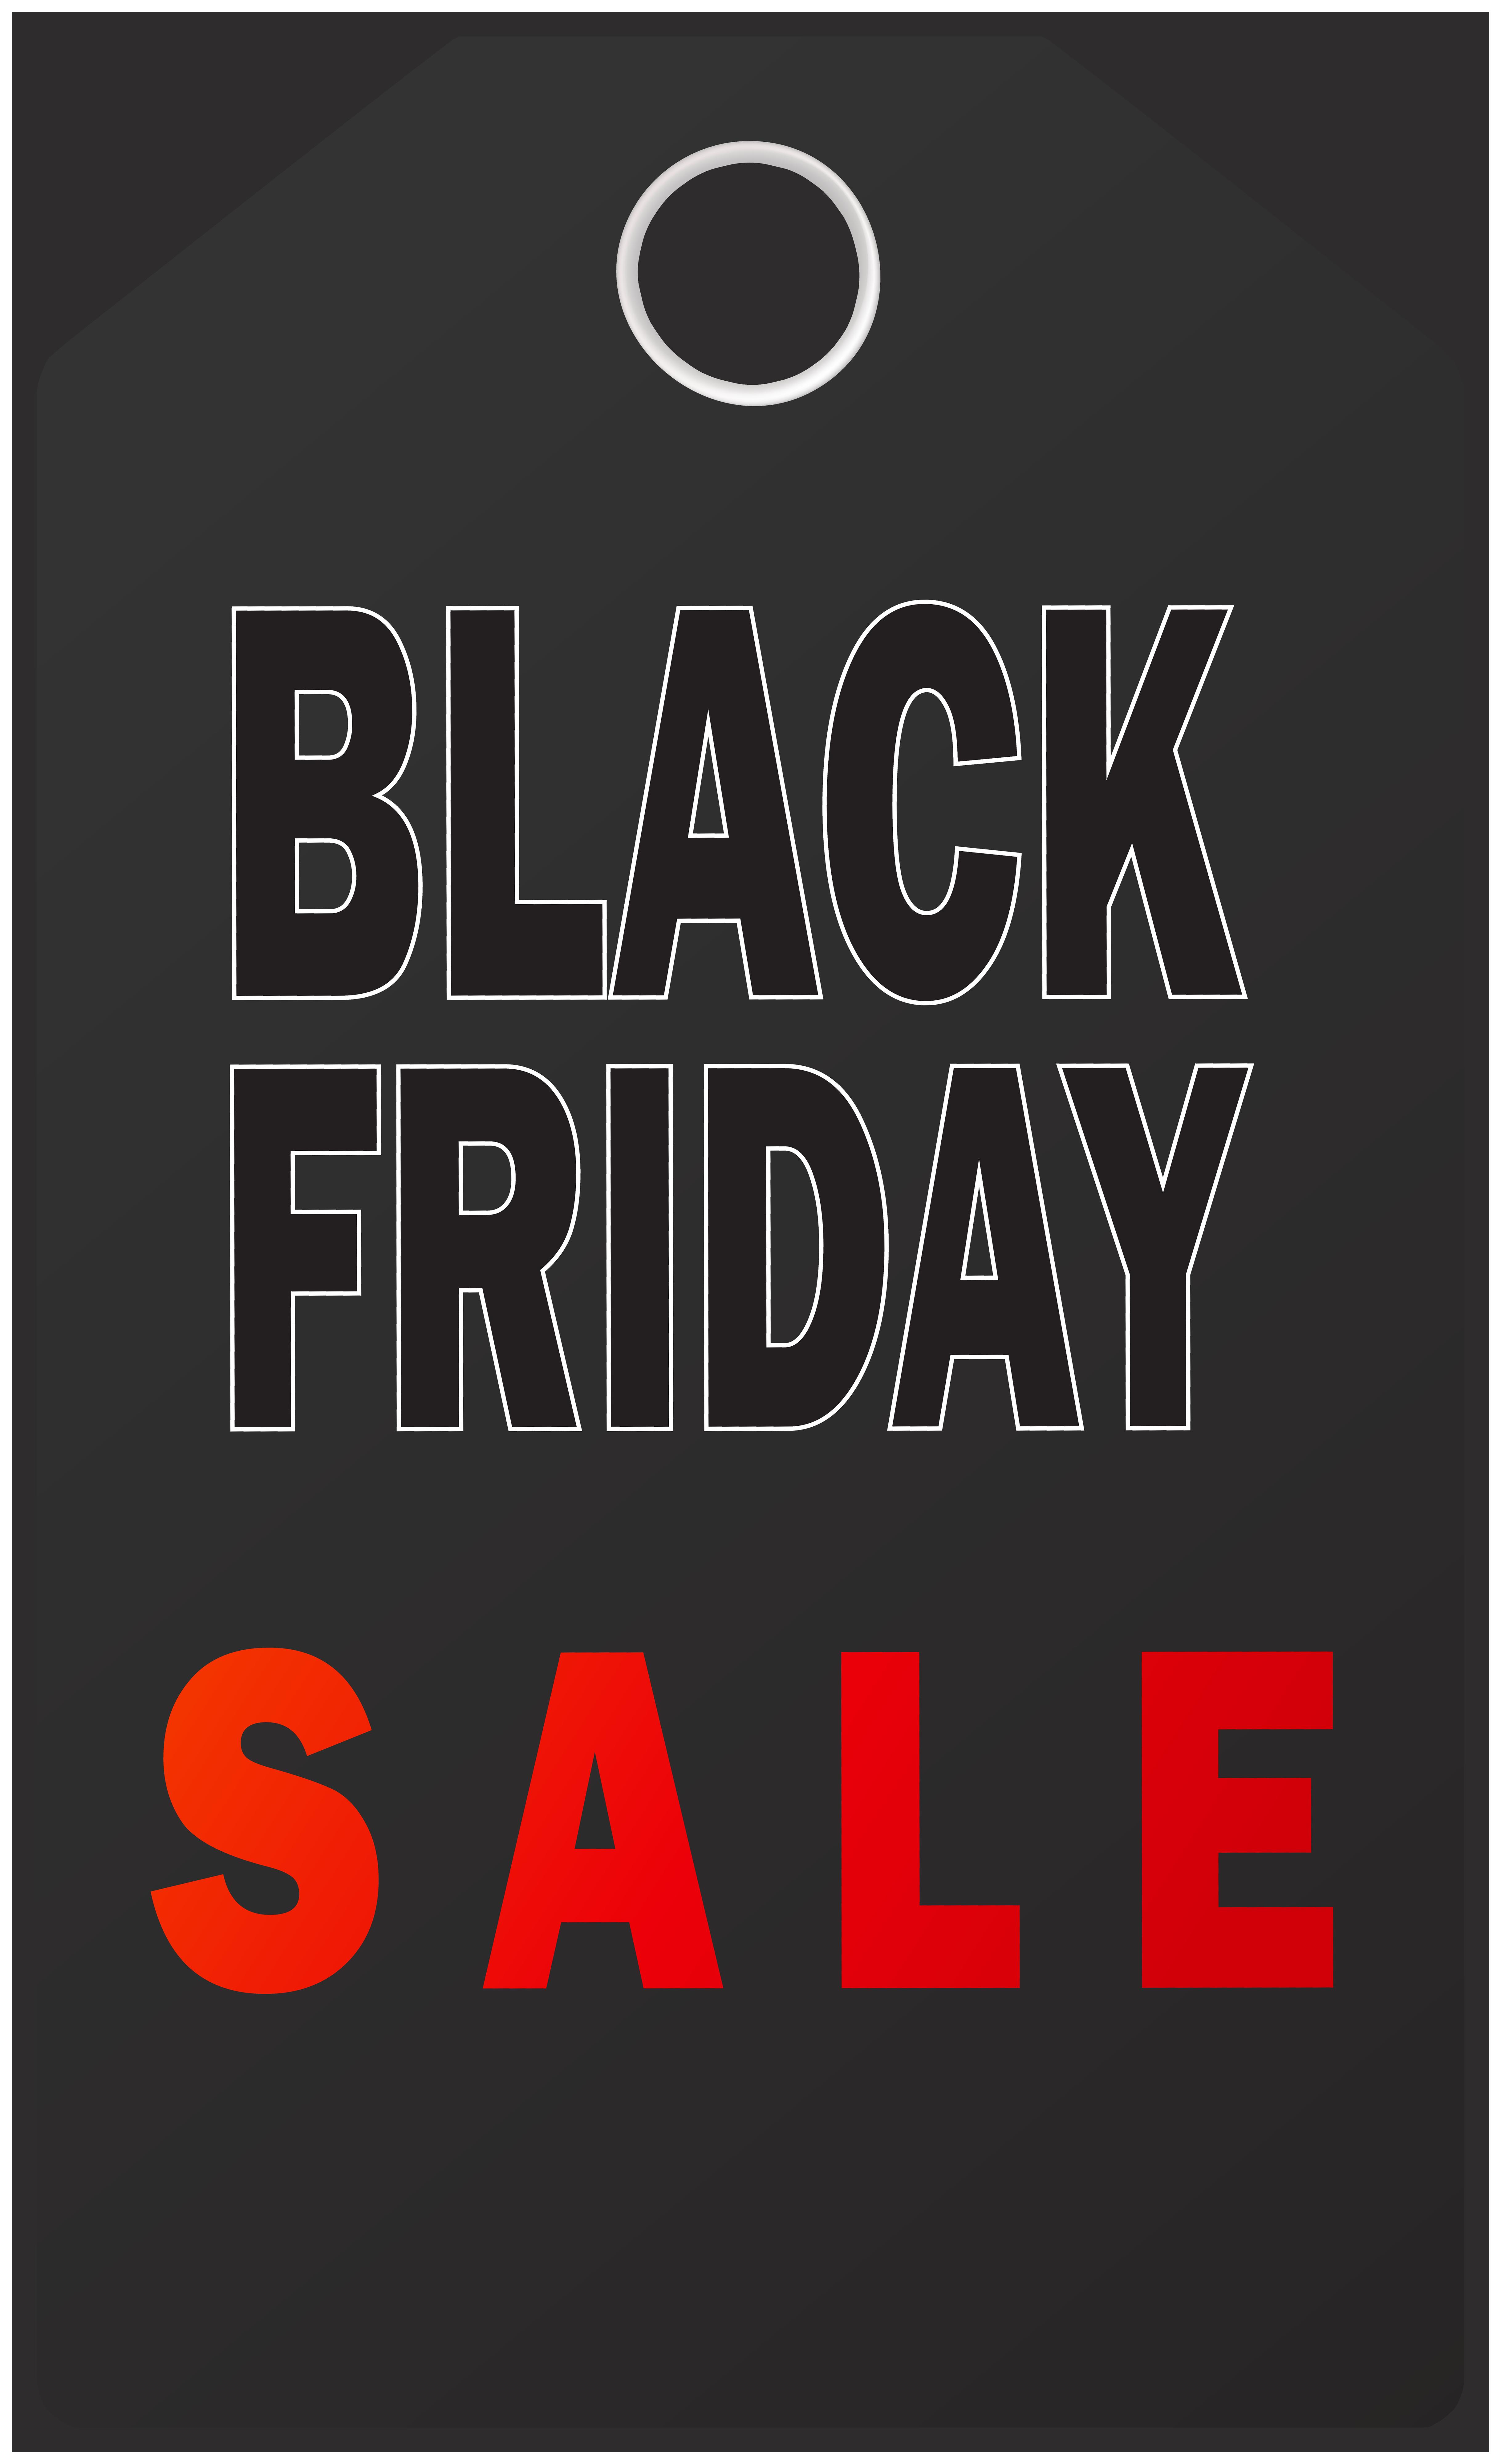 Black Friday Sale Tag PNG Clip Art Image.